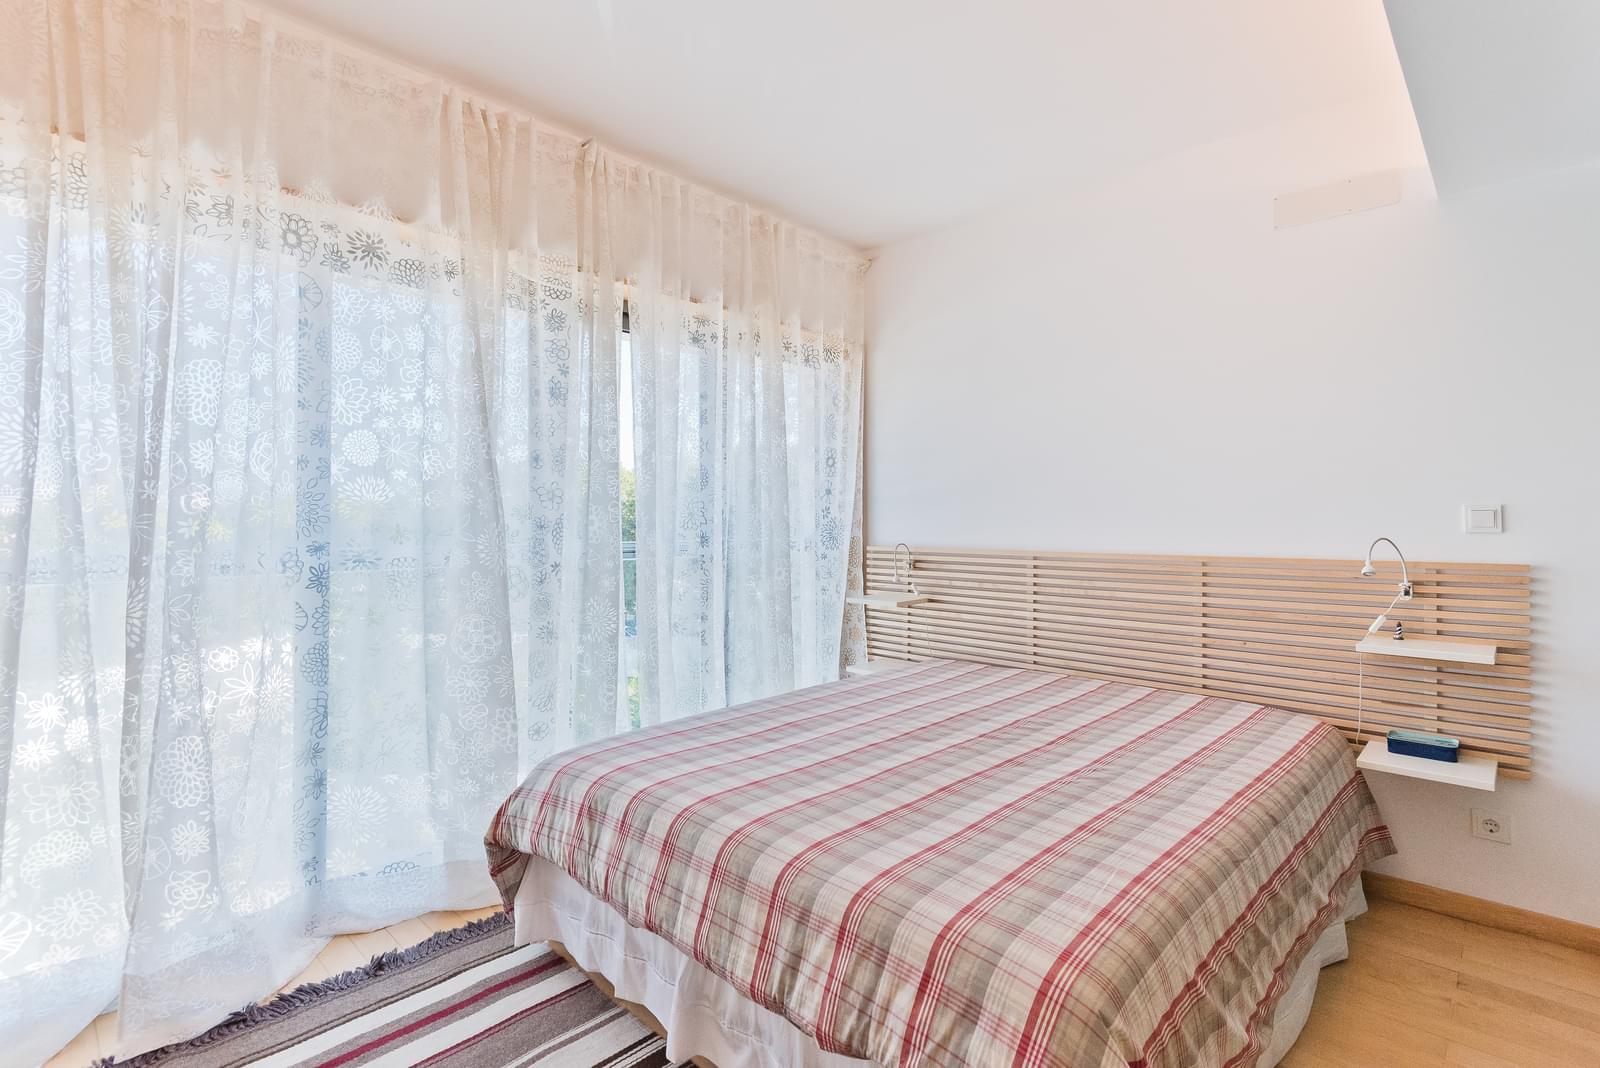 pf17983-apartamento-t2-cascais-587a78a7-0ded-4275-9f8d-c4dd0e609c4e